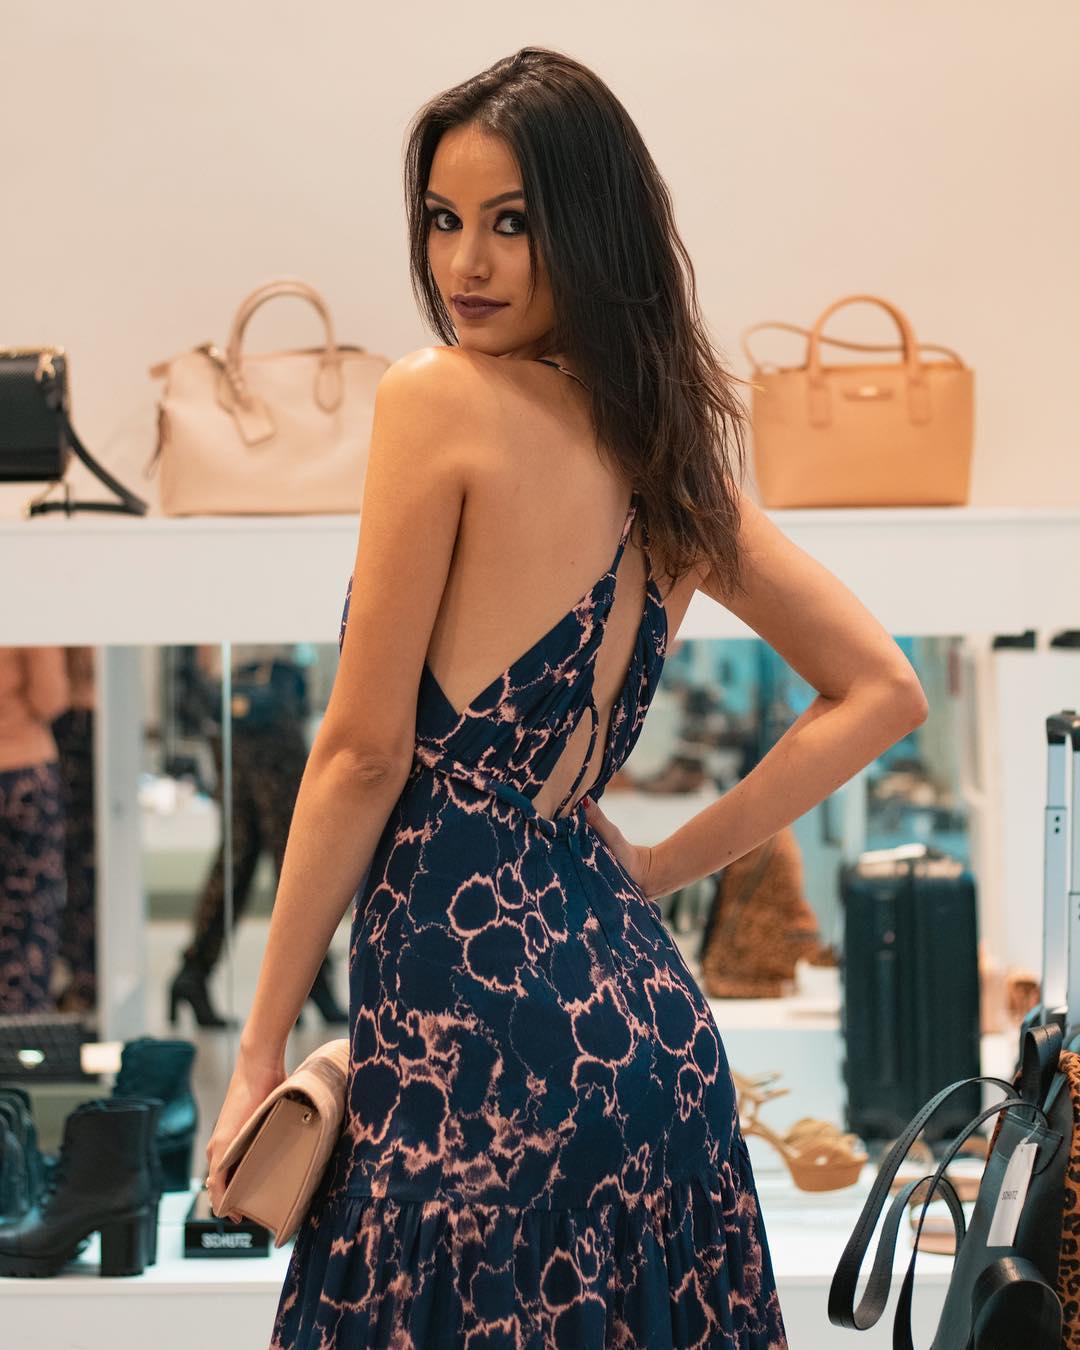 rafaella felipe, top 20 de miss brasil mundo 2019. - Página 6 55734810